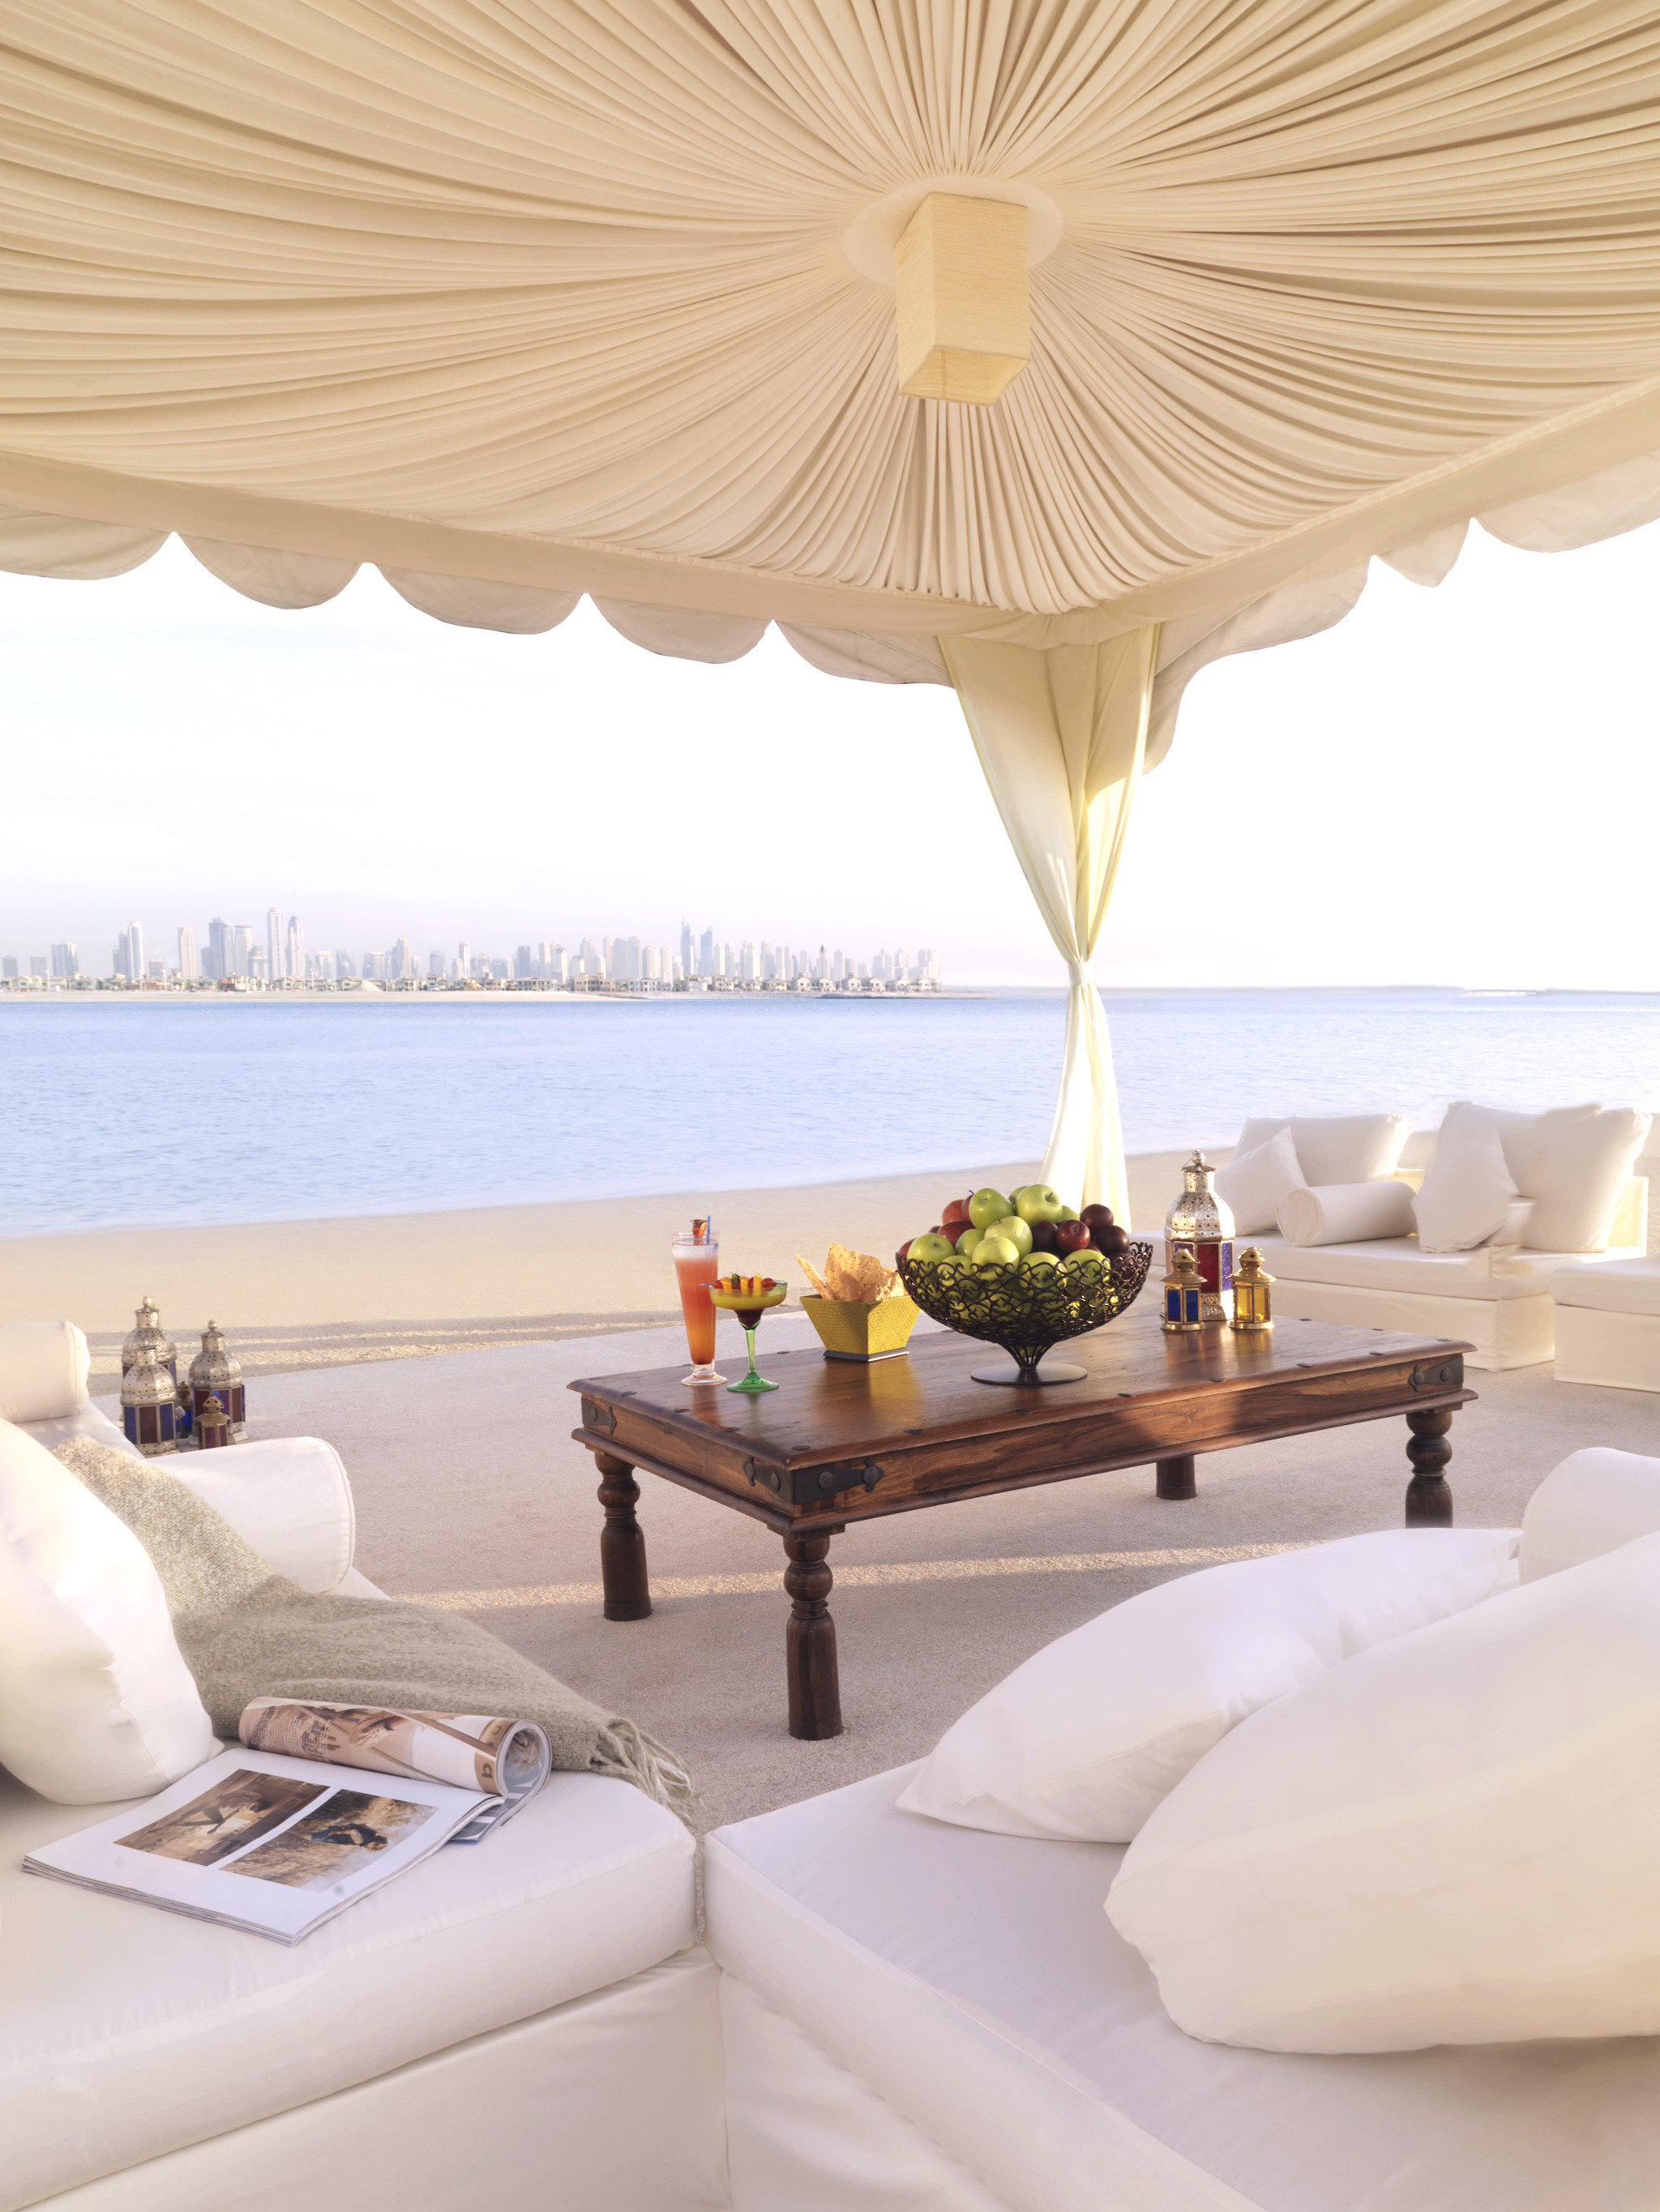 Drink Dubai Food + Drink Hotels Lounge Luxury Travel Middle East Resort Waterfront living room